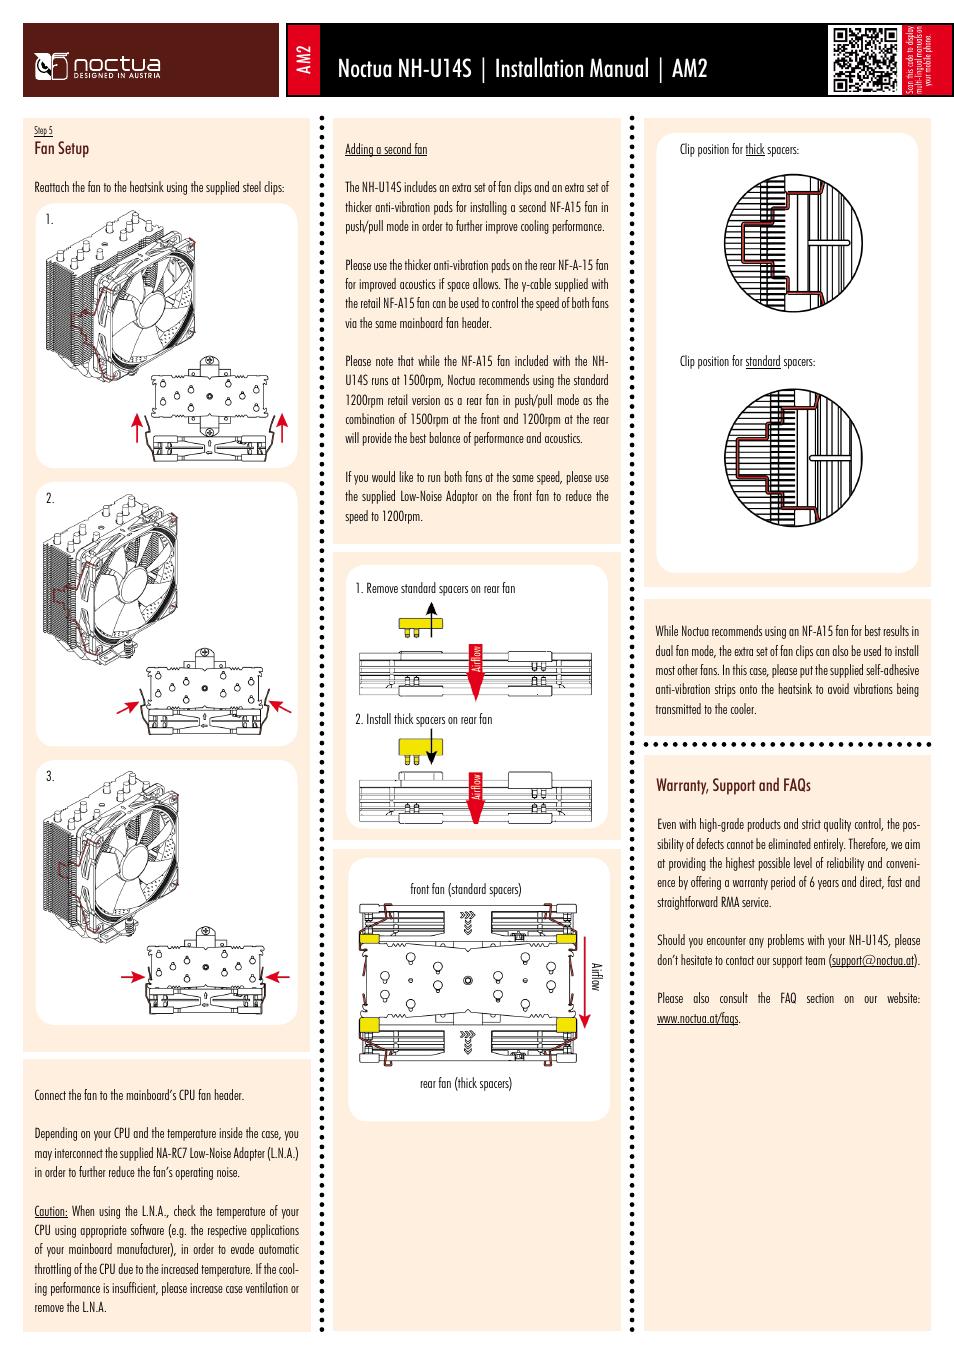 Noctua Nh U14s Installation Manual Am2 User Page 6